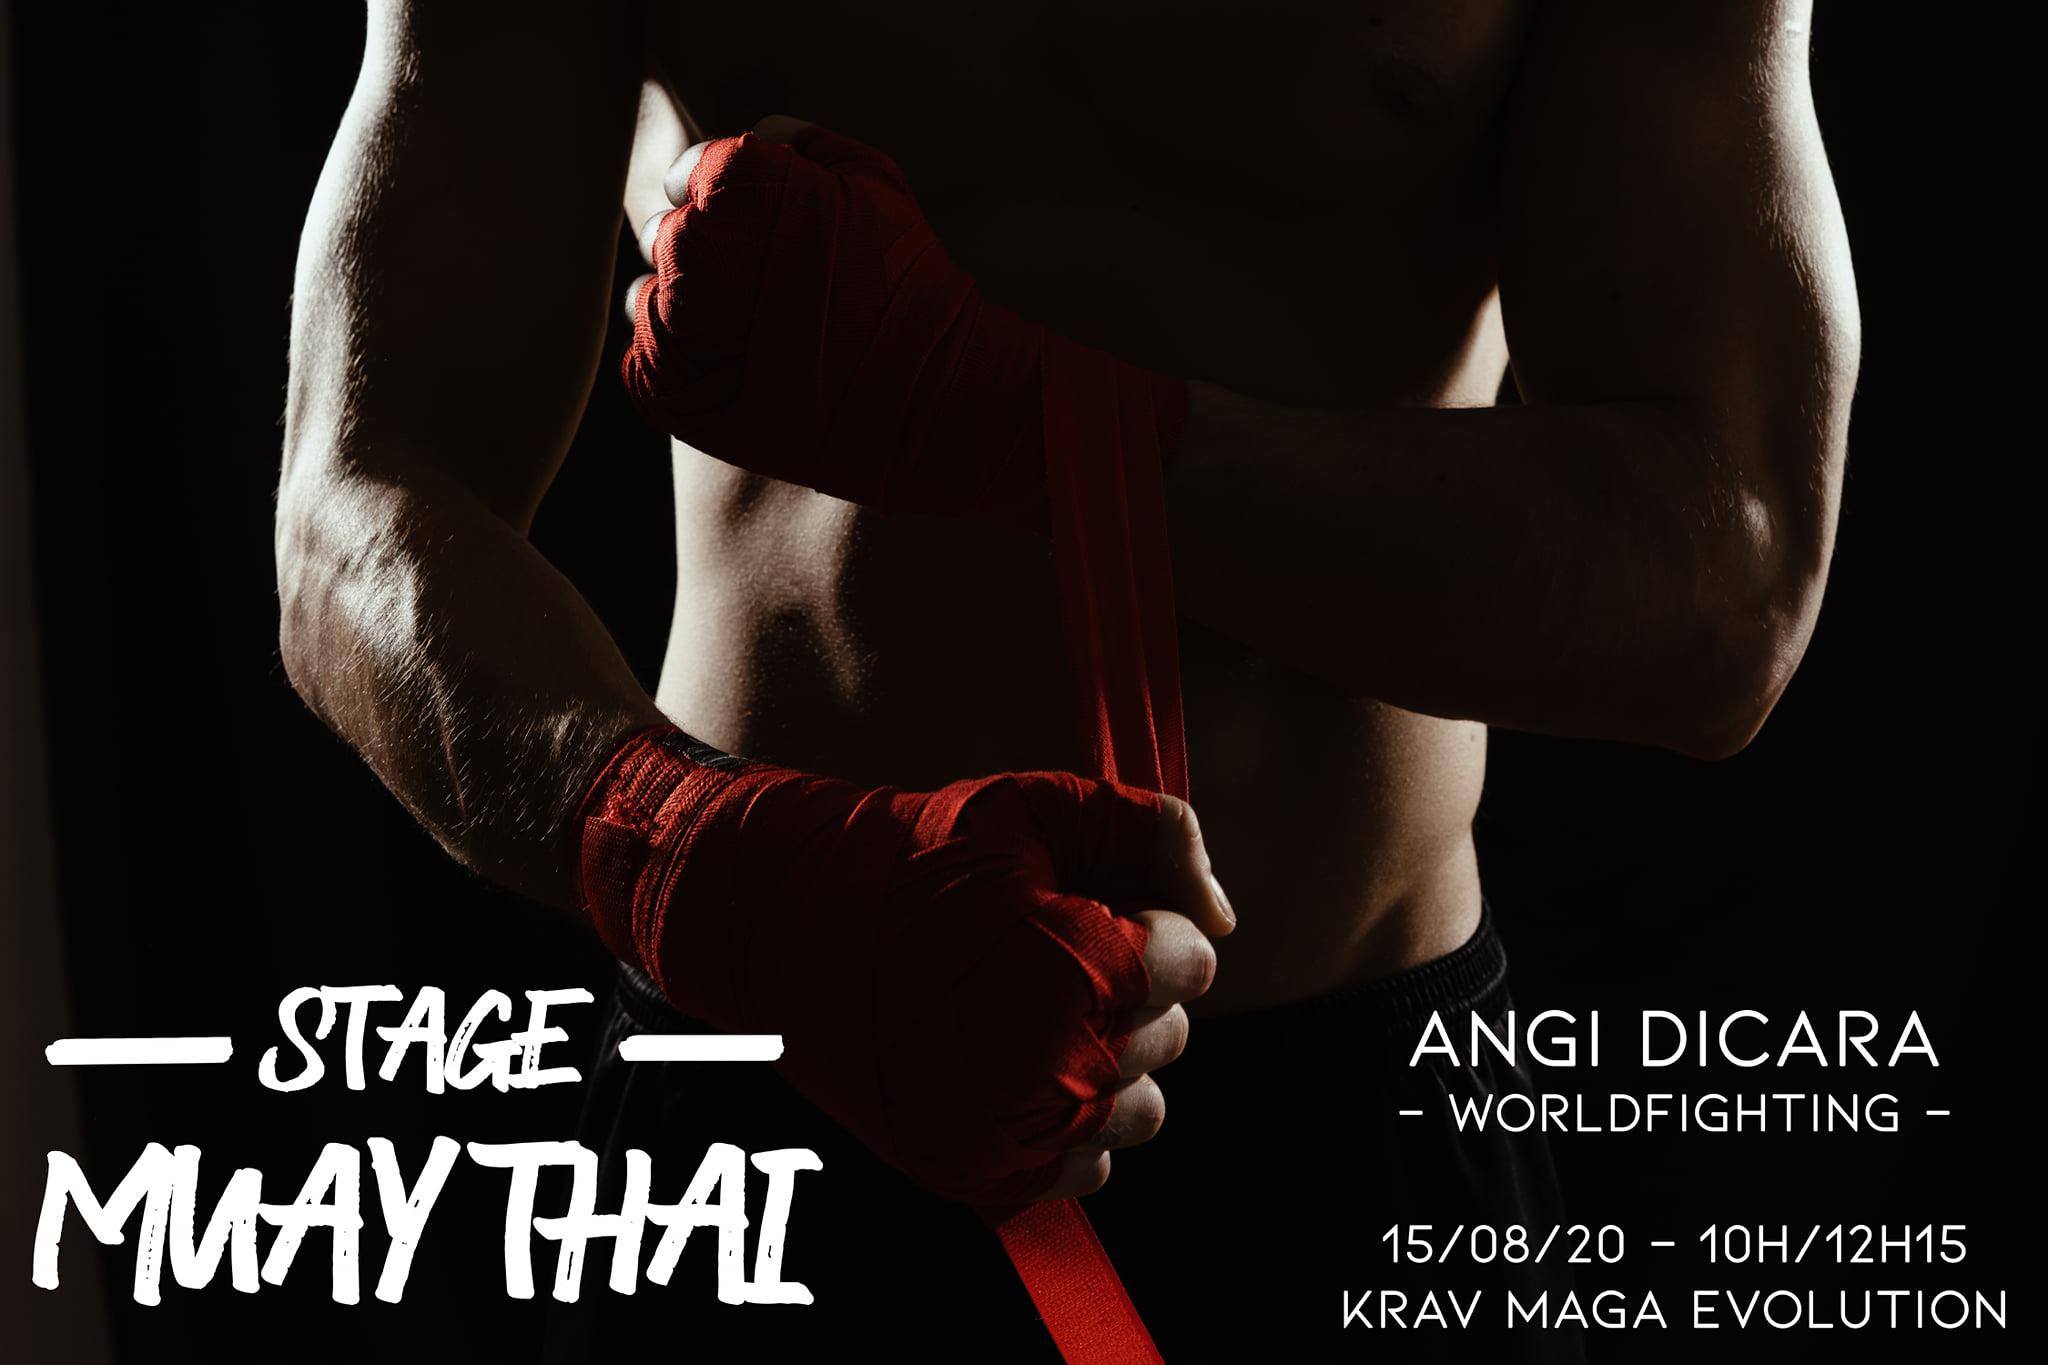 Stage krav maga Muay Thai